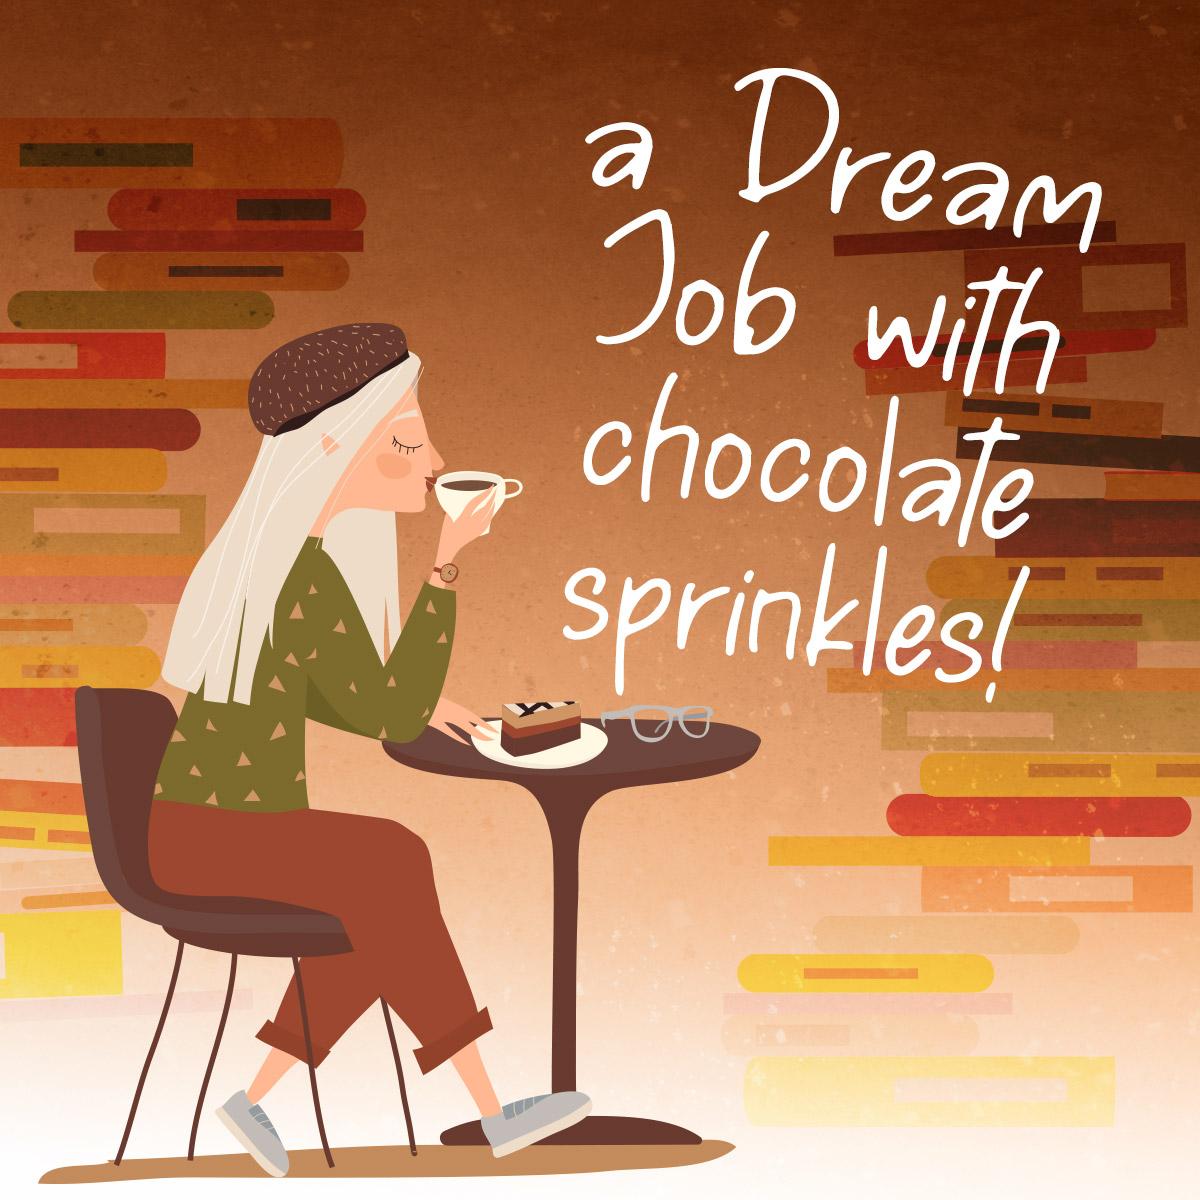 A Dream Job with Chocolate Sparkles